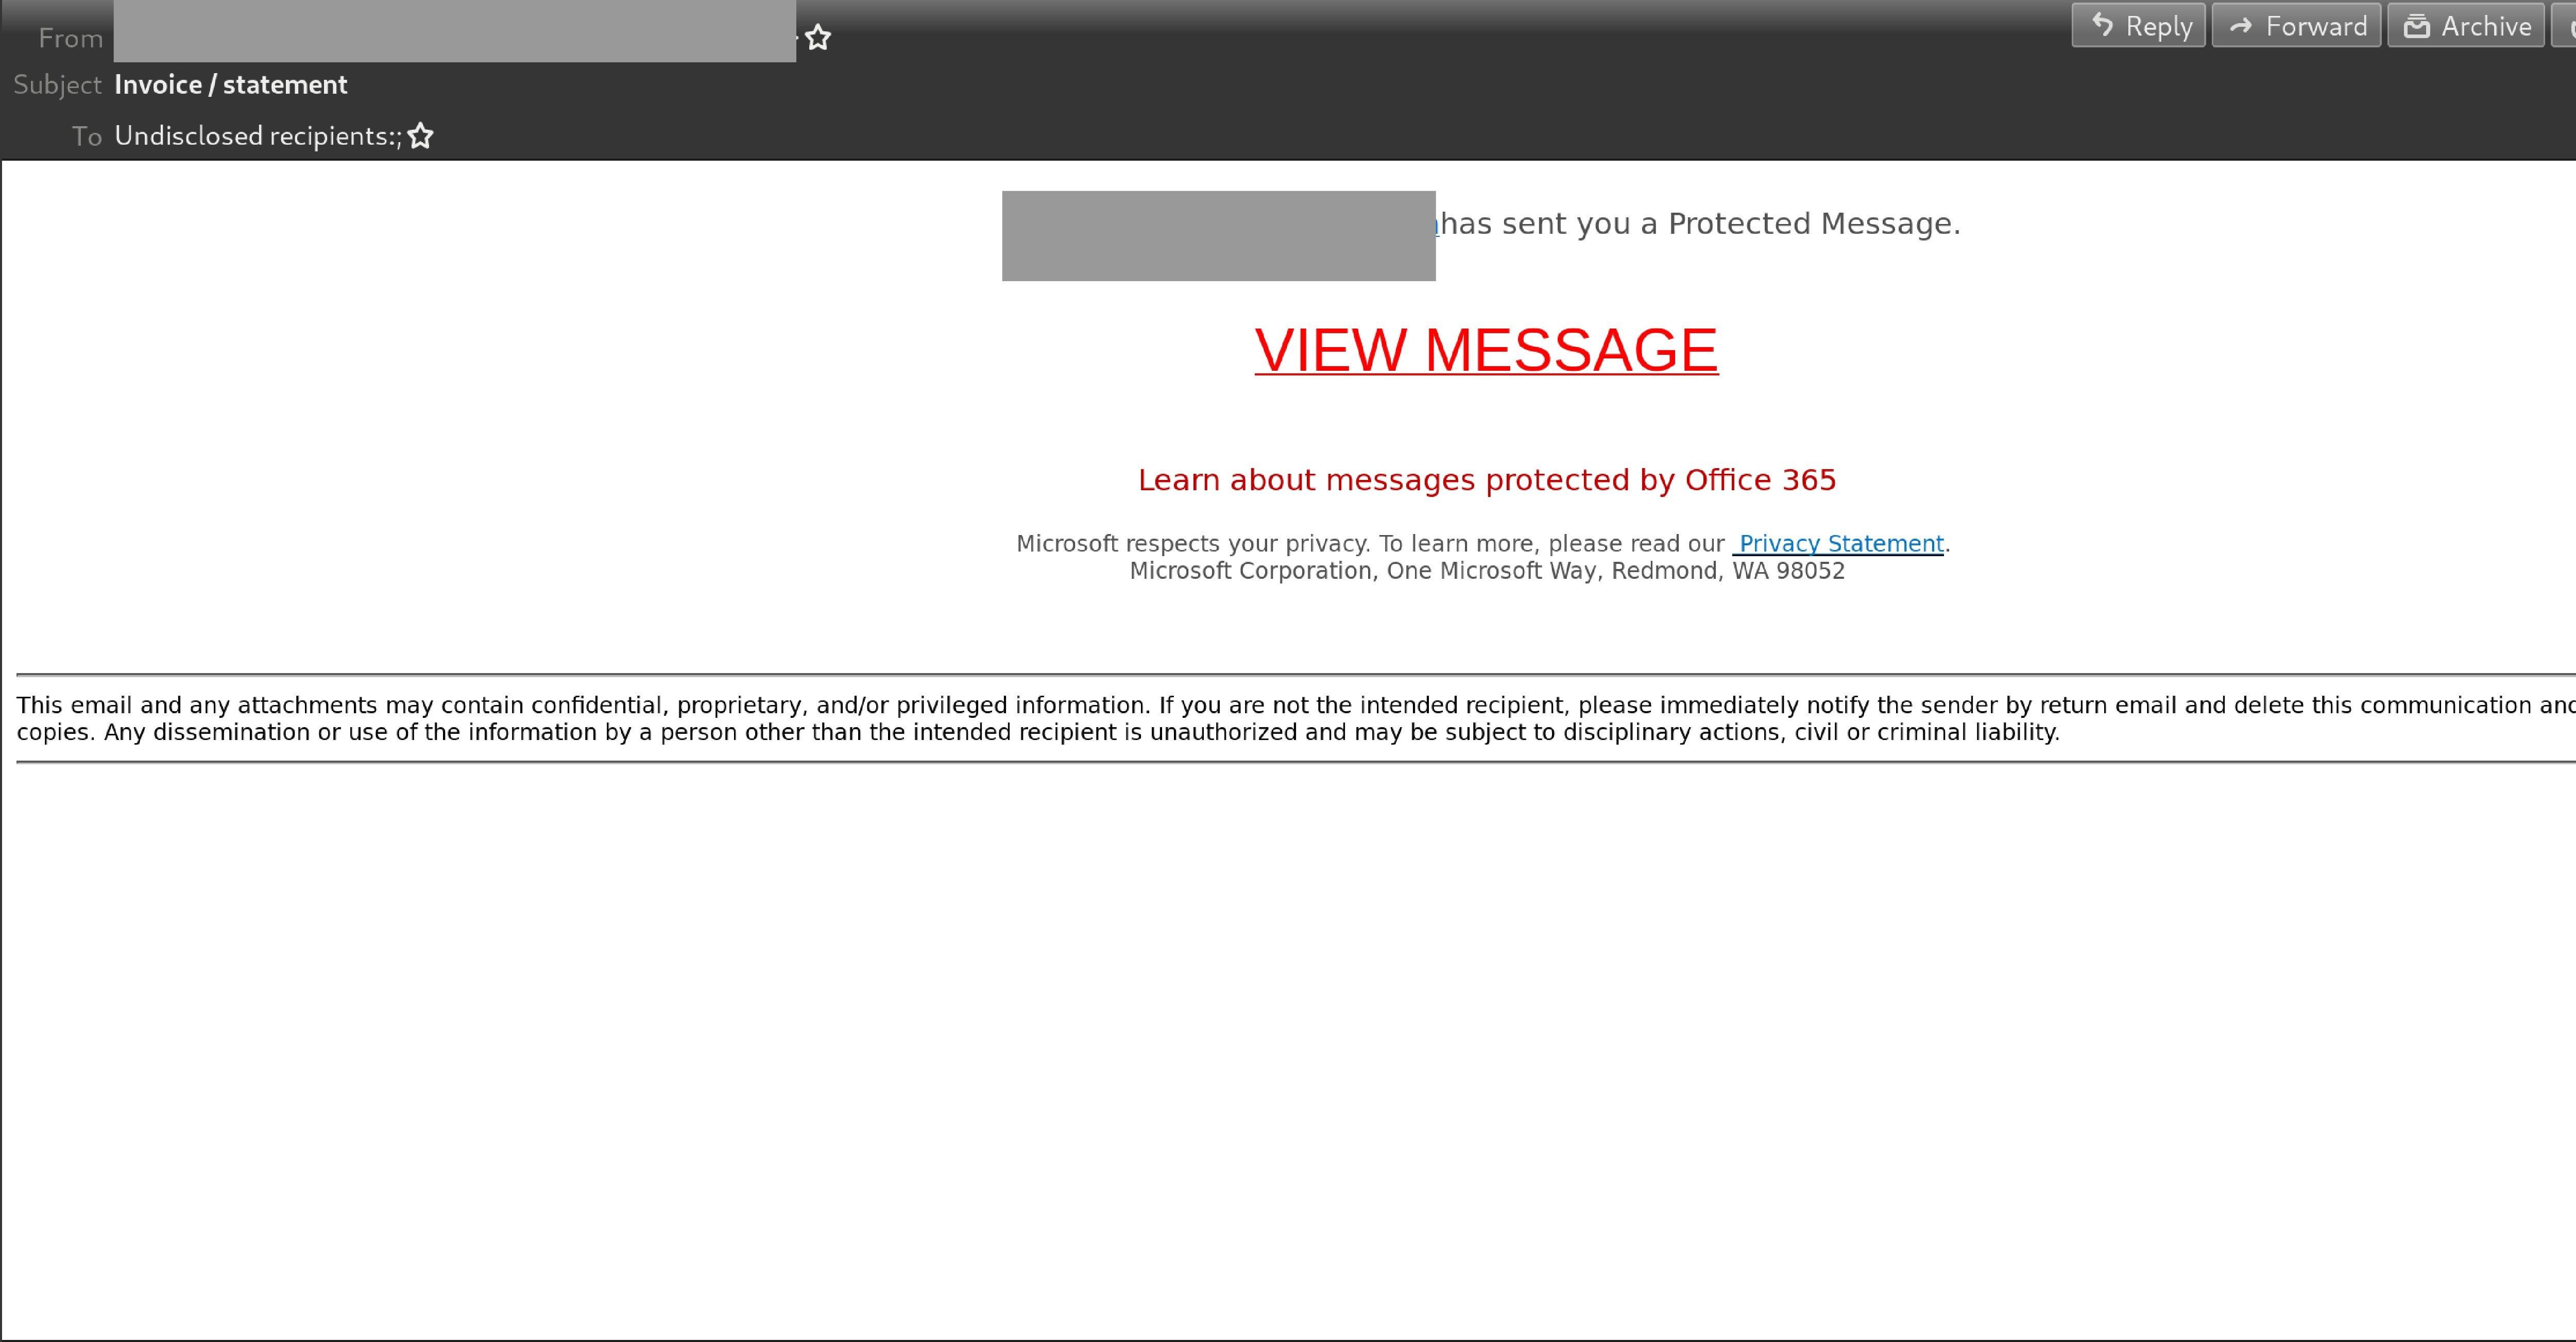 invoice statement